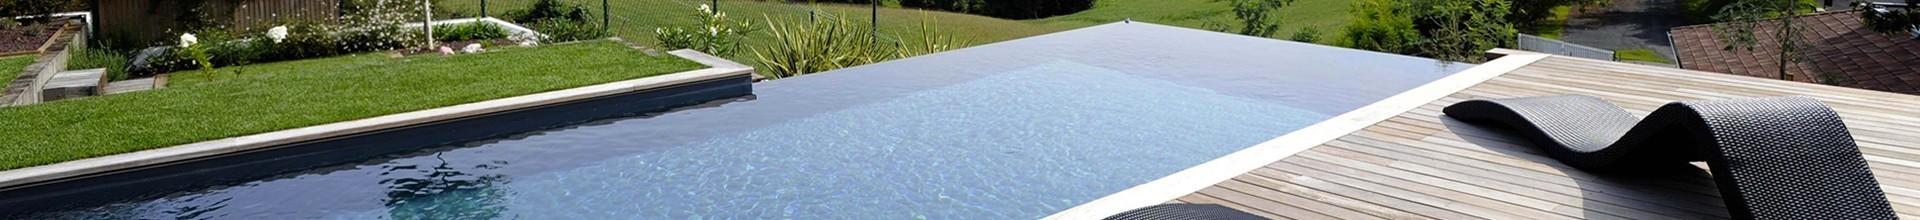 Direct usine, piscine coque prix Yverdon-les-Bains